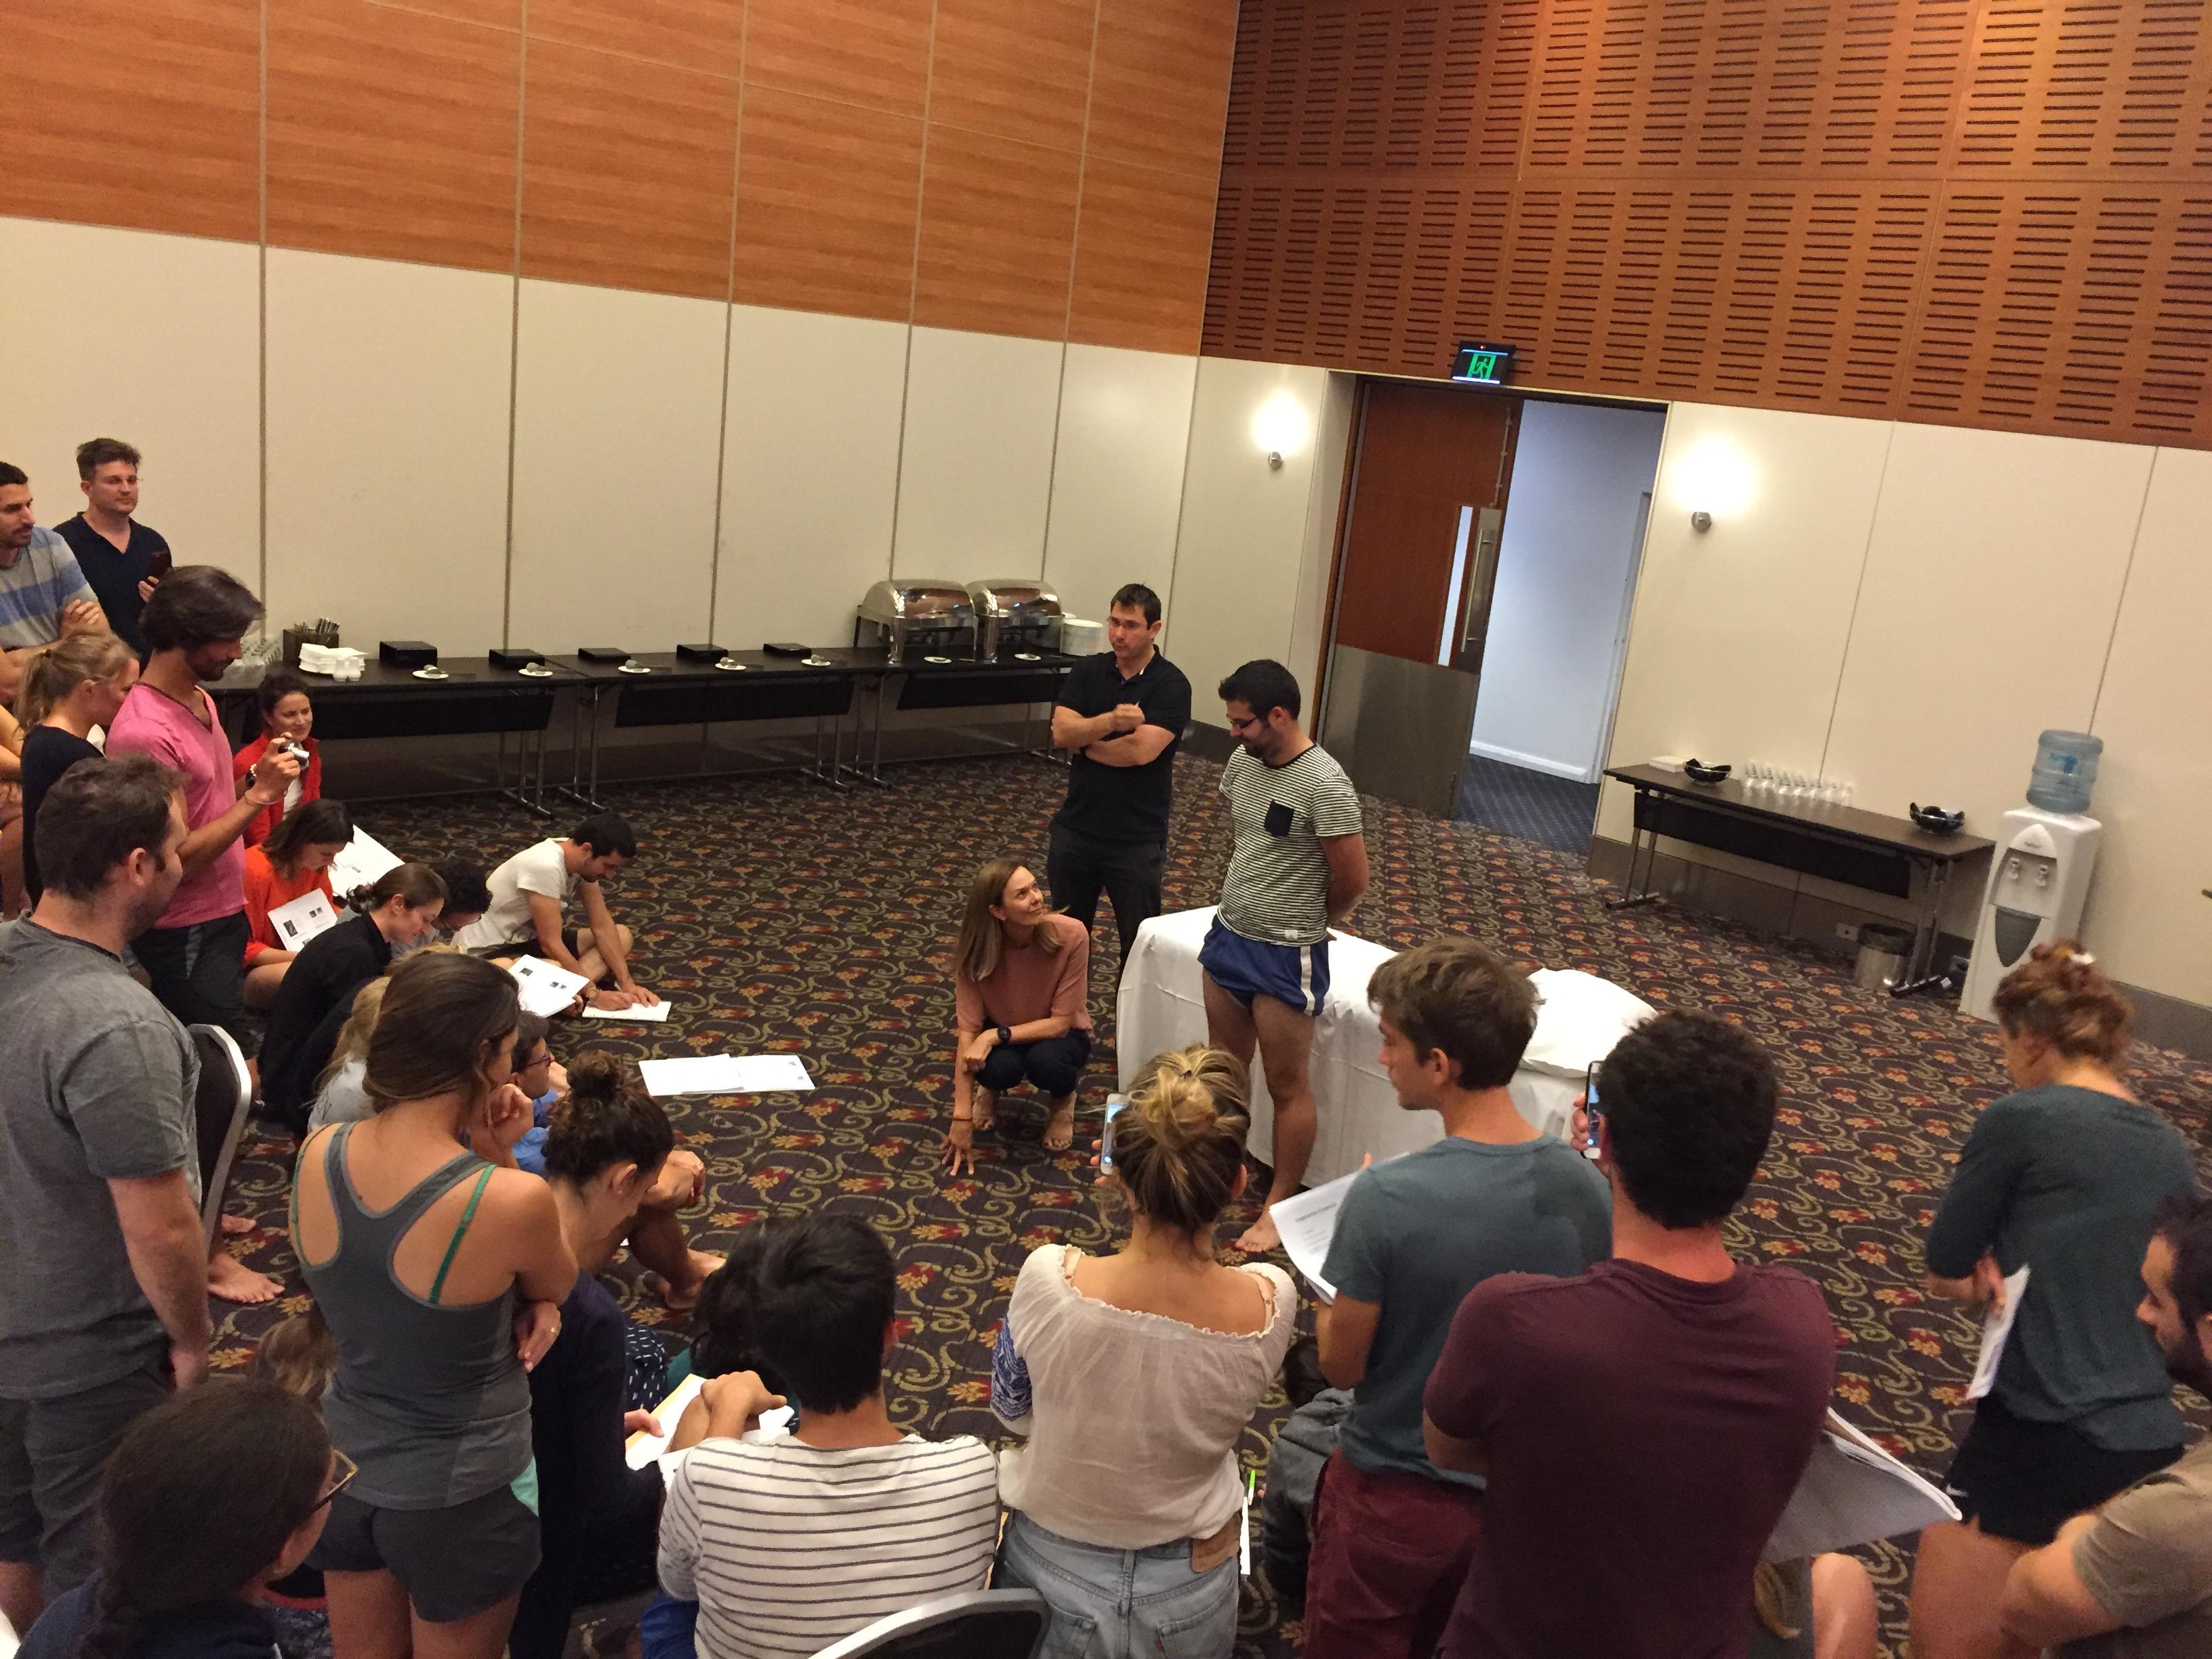 Perth 2017 Extrémités : seconde semaine